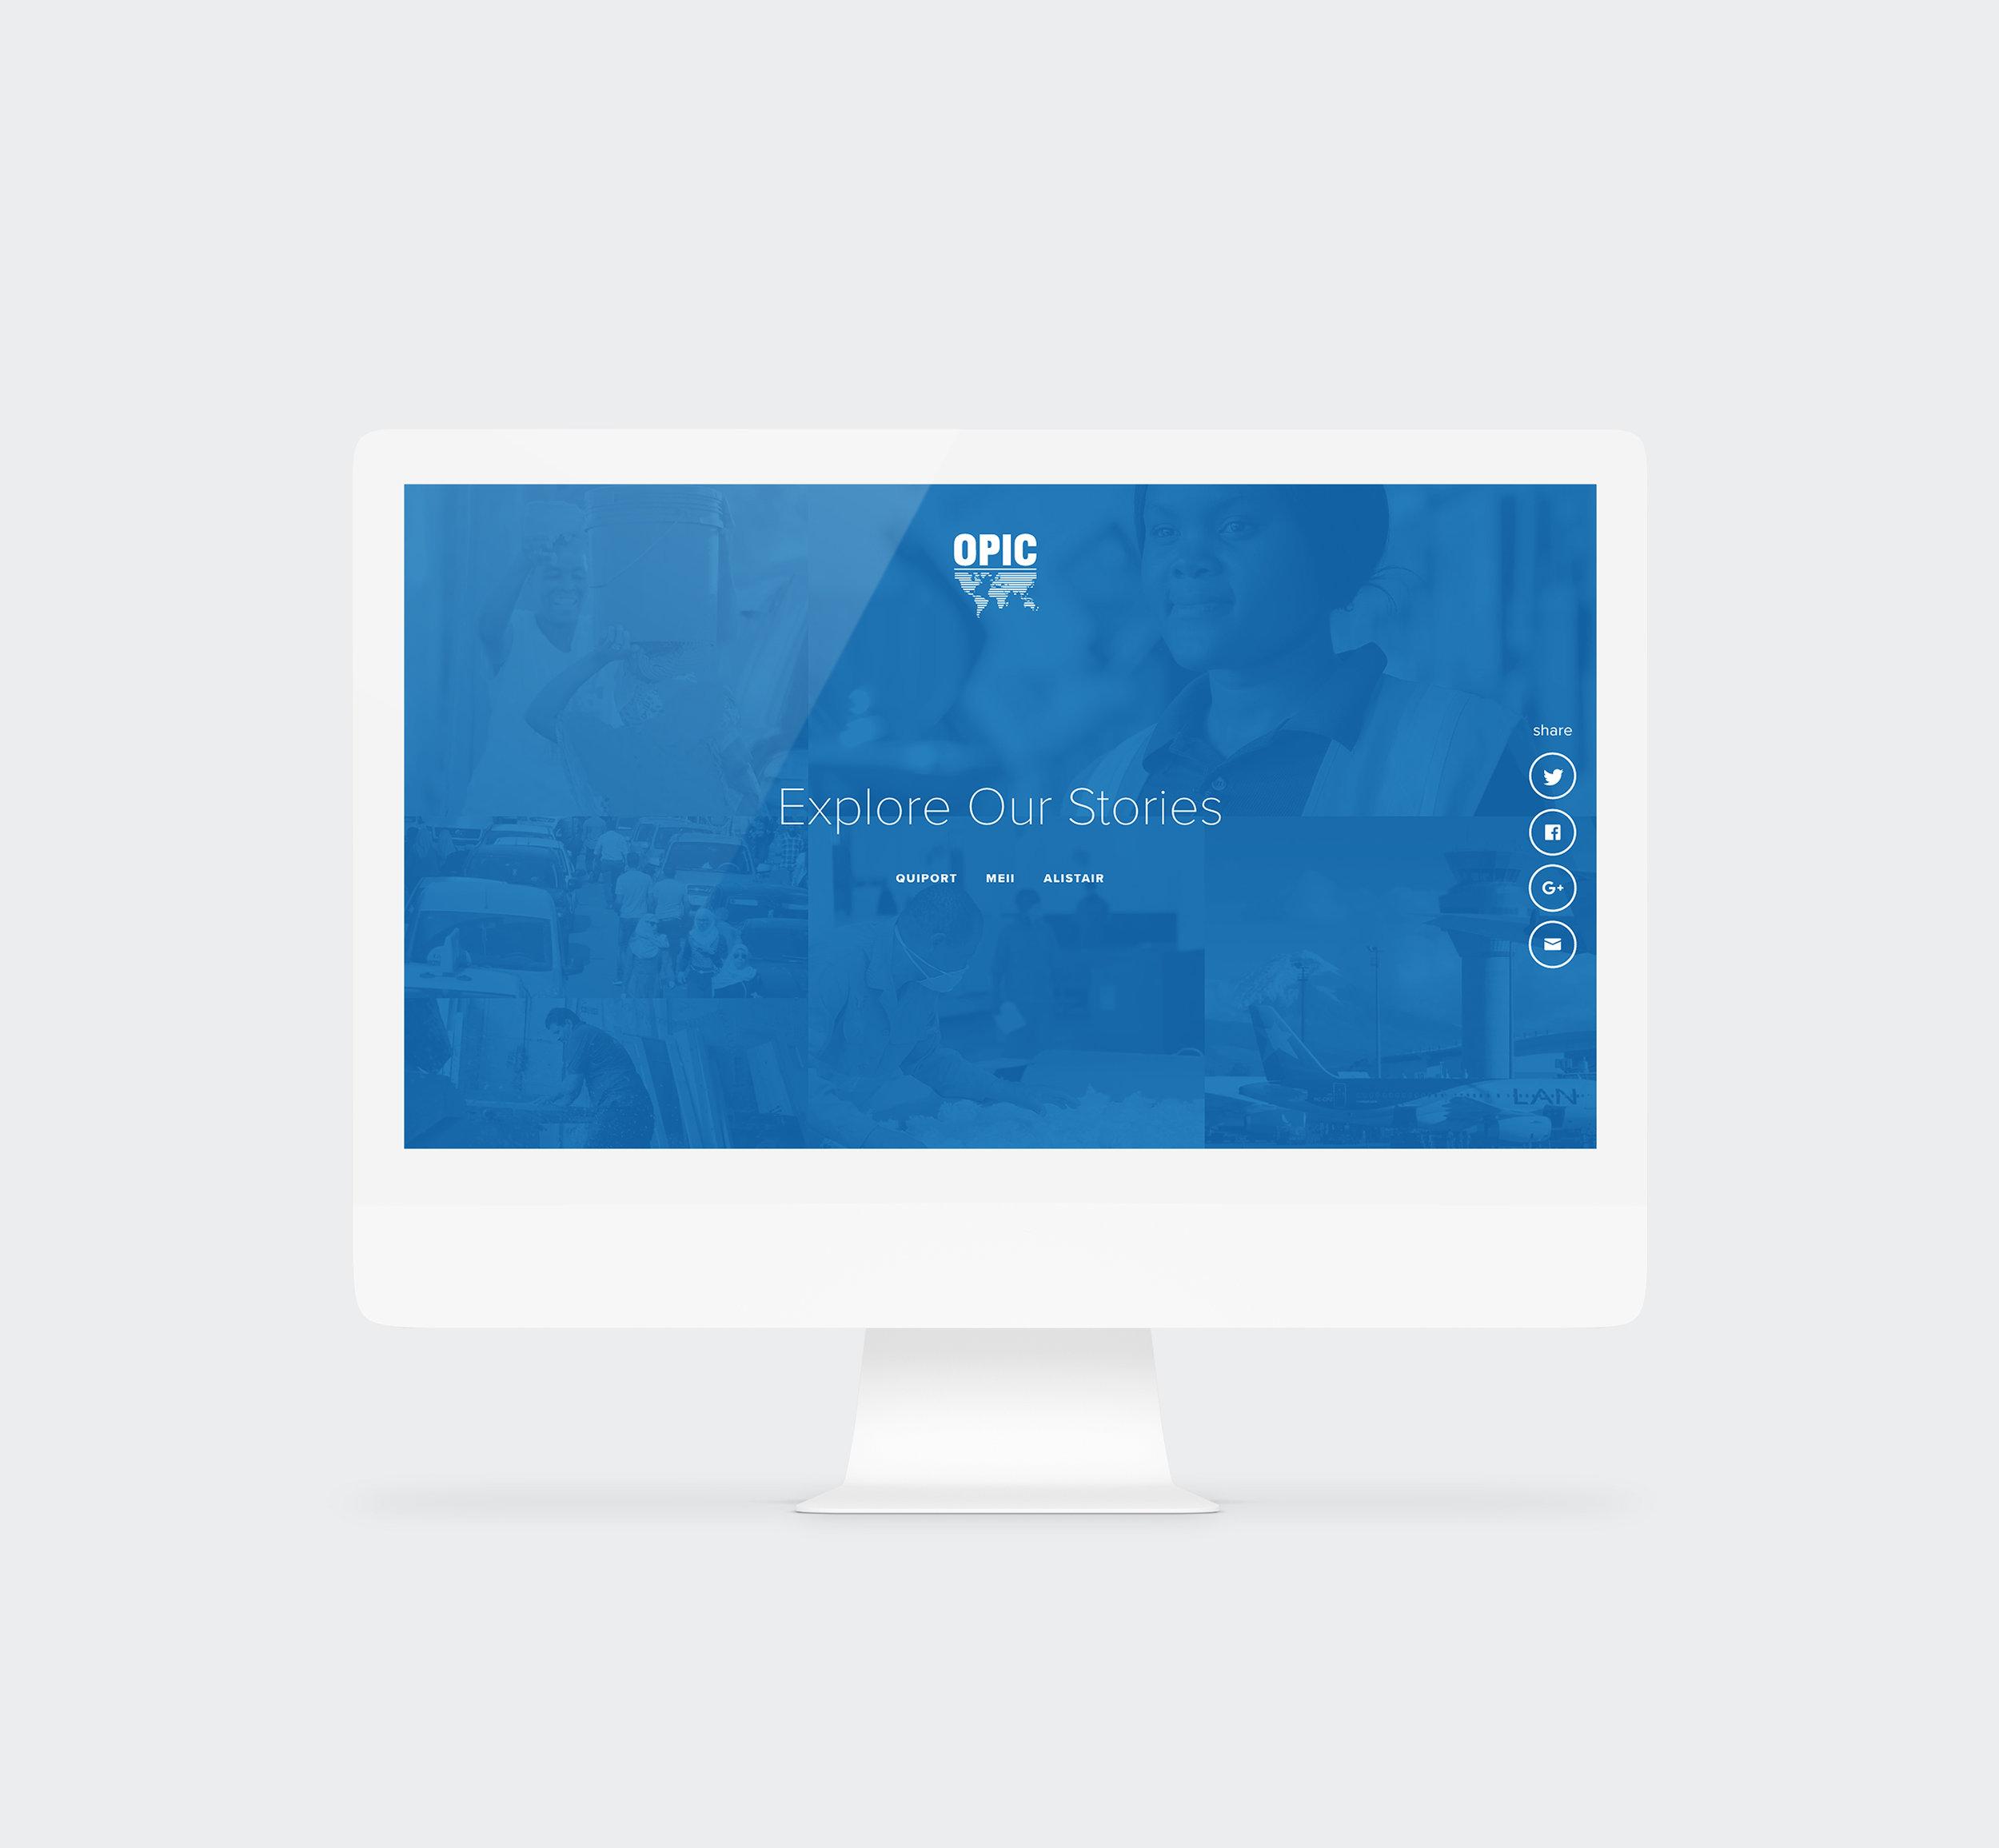 opic-desktop-home.jpg